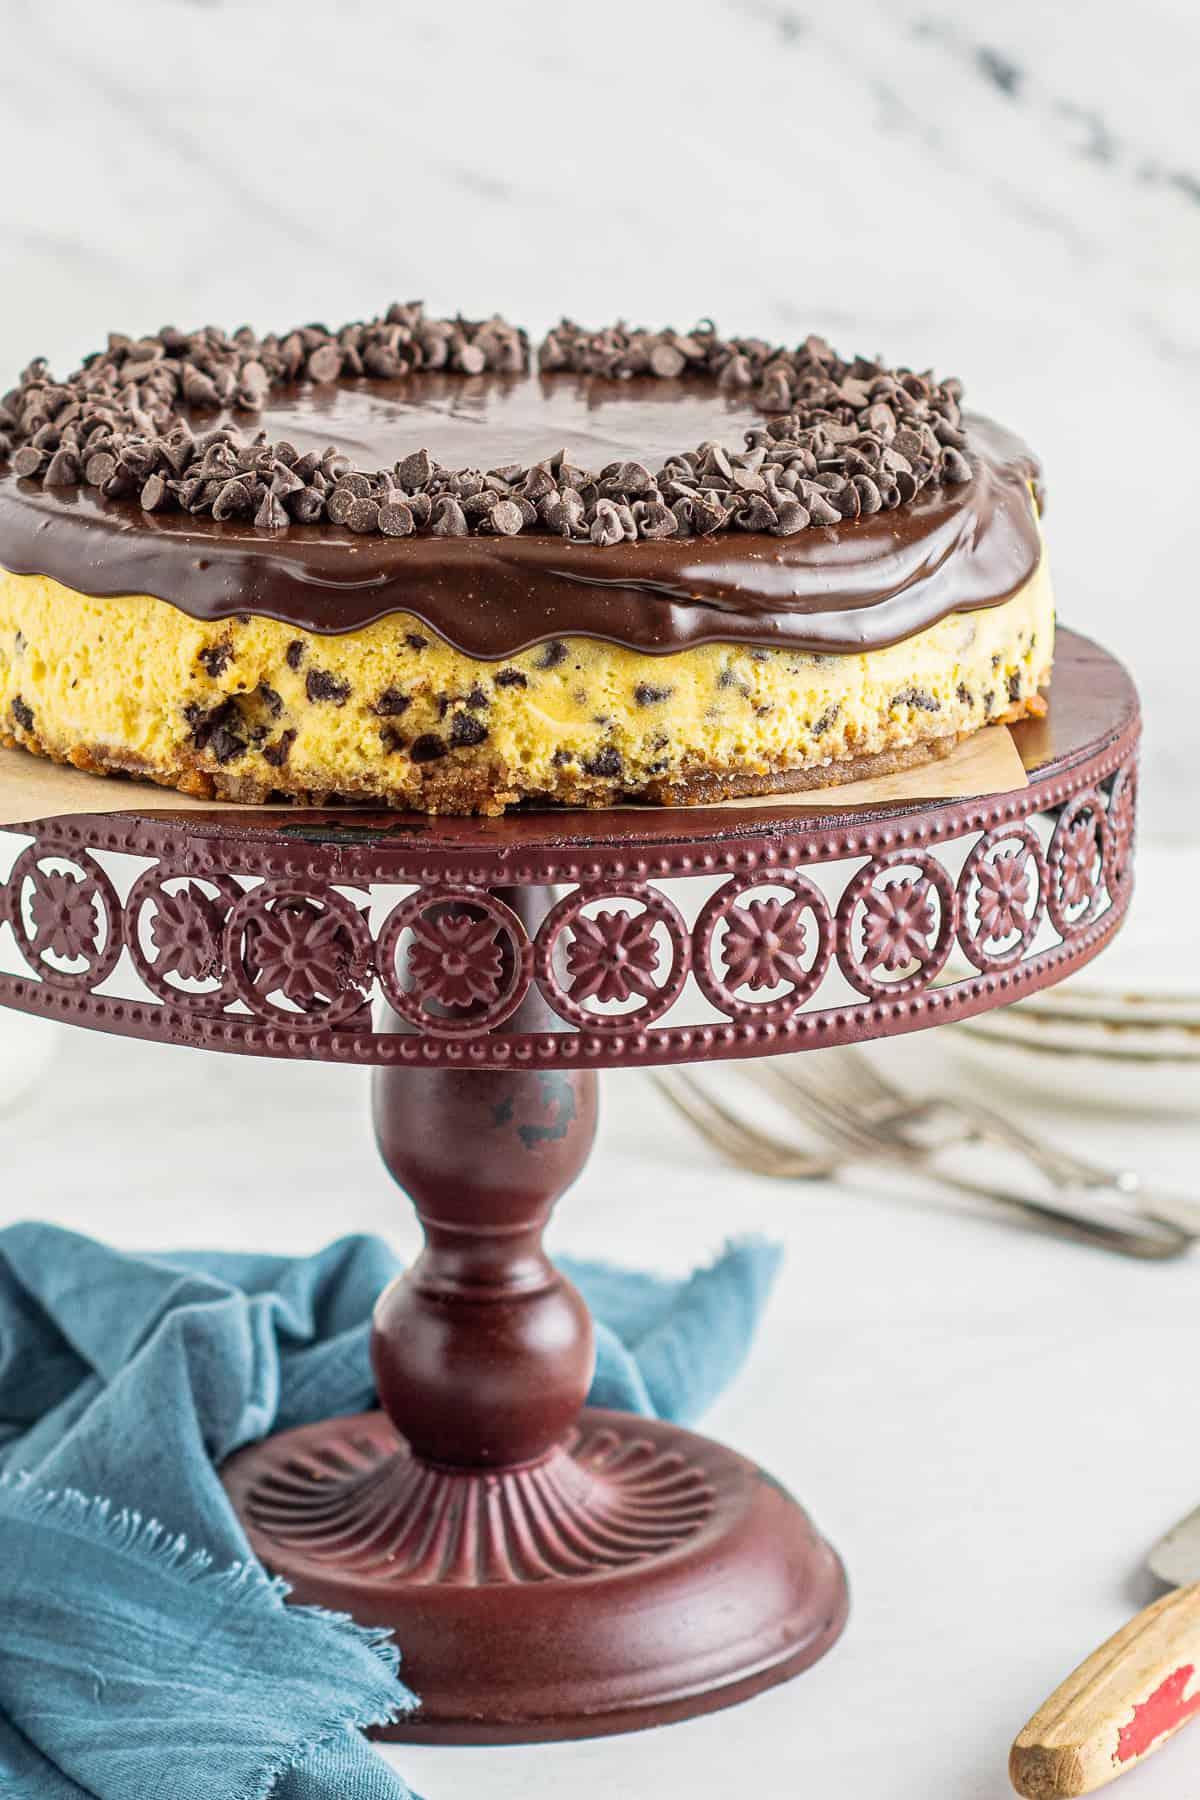 chocolate chip cheesecake on cake stand